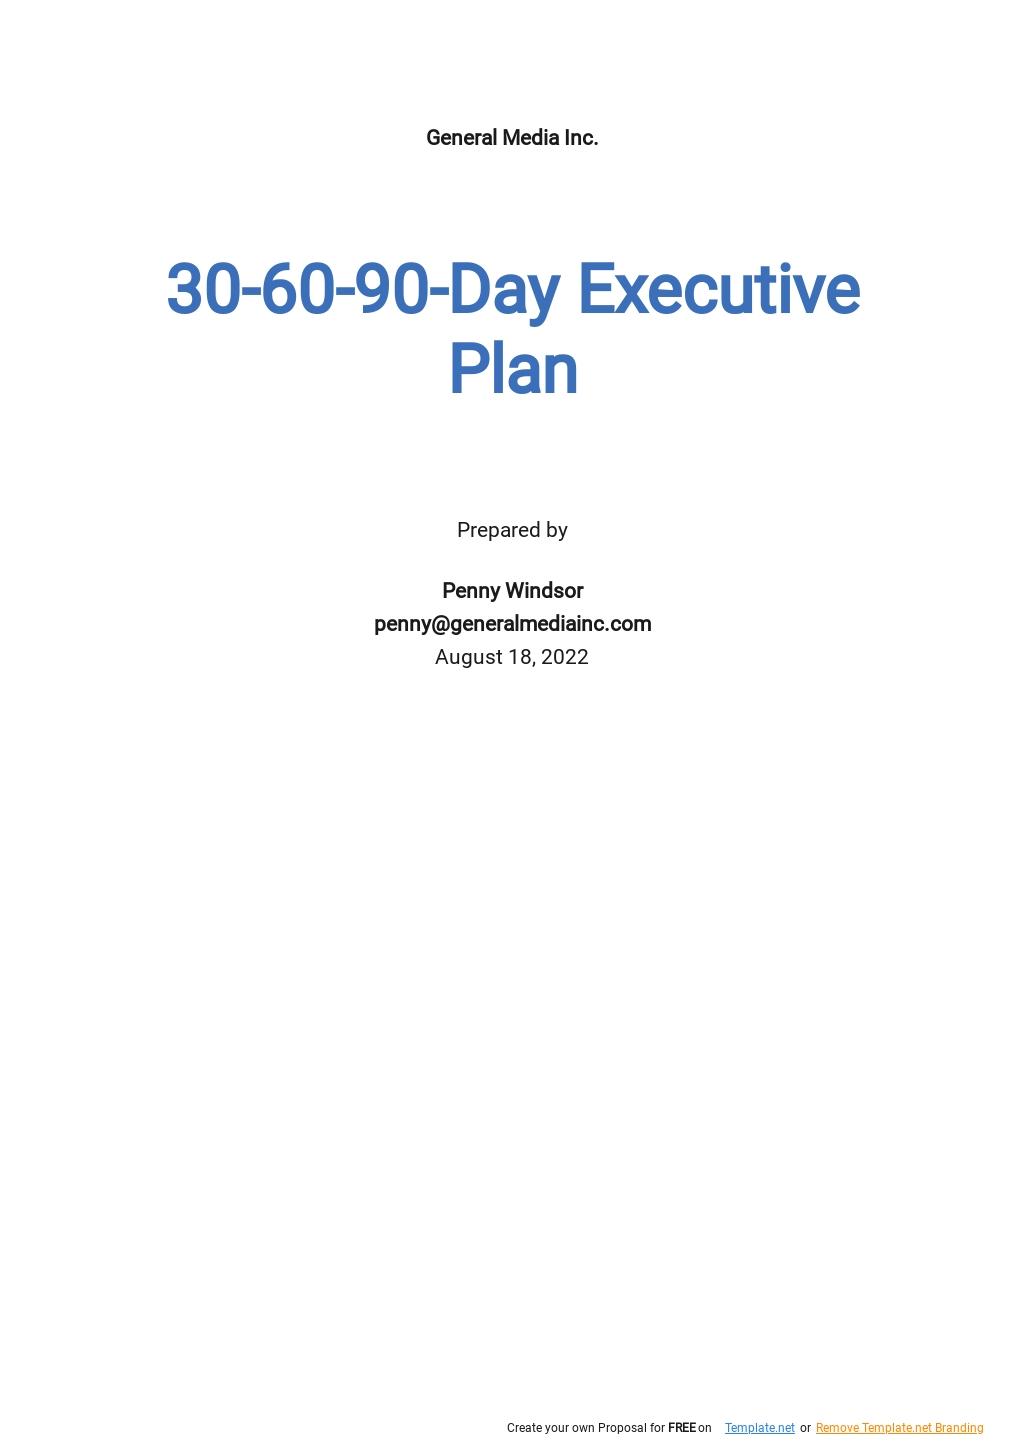 30 60 90 day Executive Plan Template.jpe